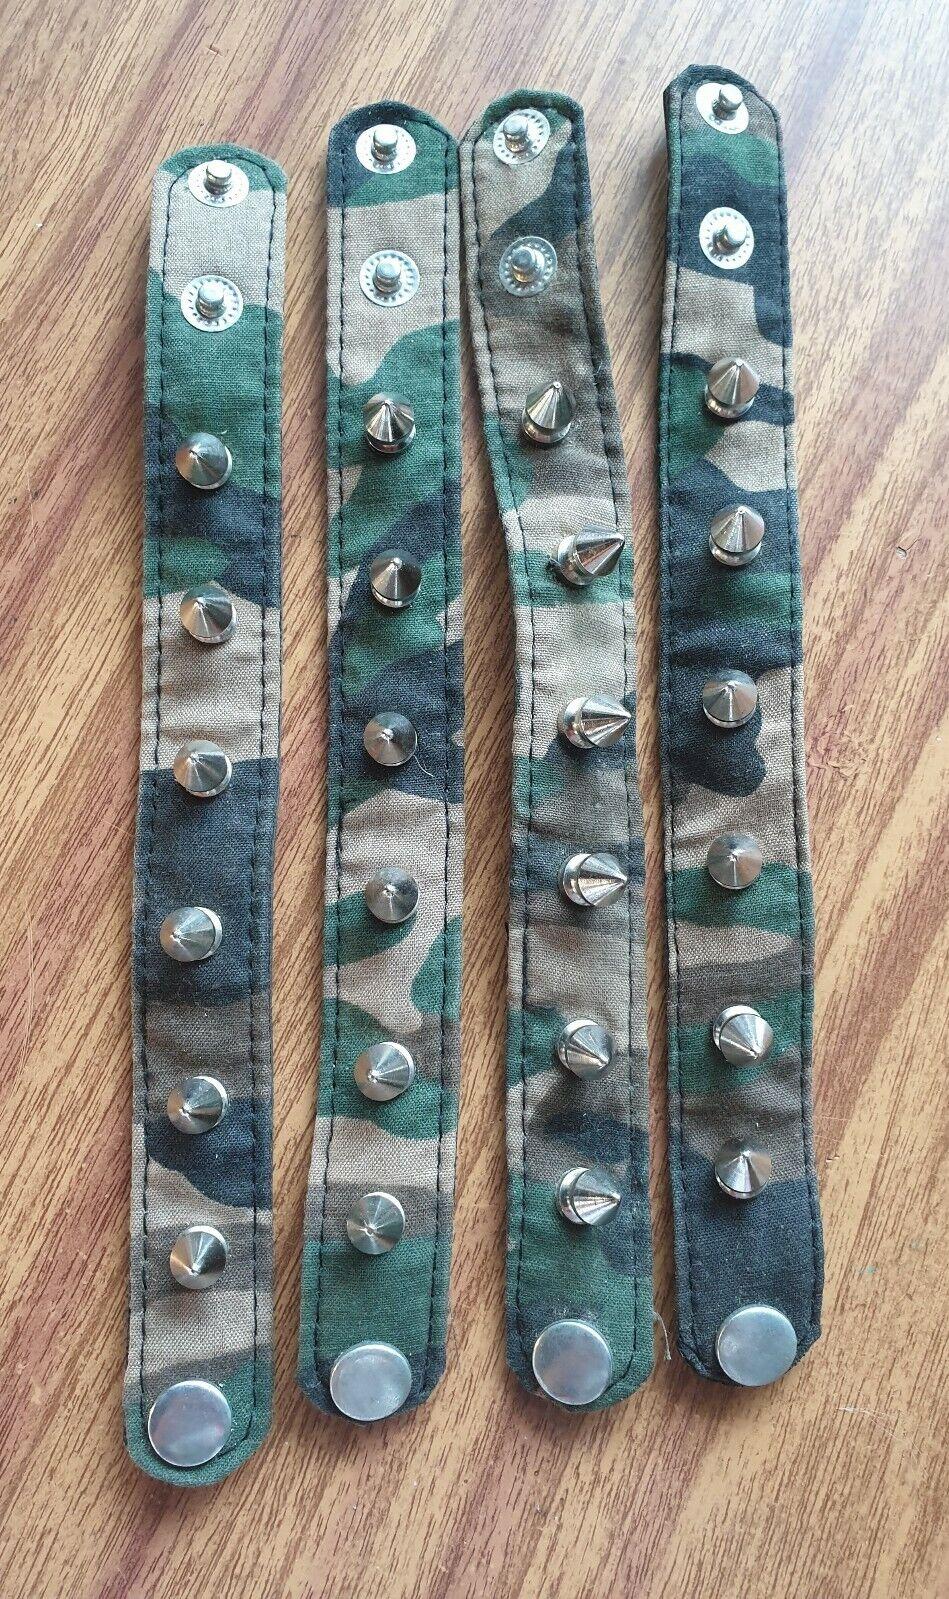 Studded Wristbands. Adjustable. Camouflage. 8